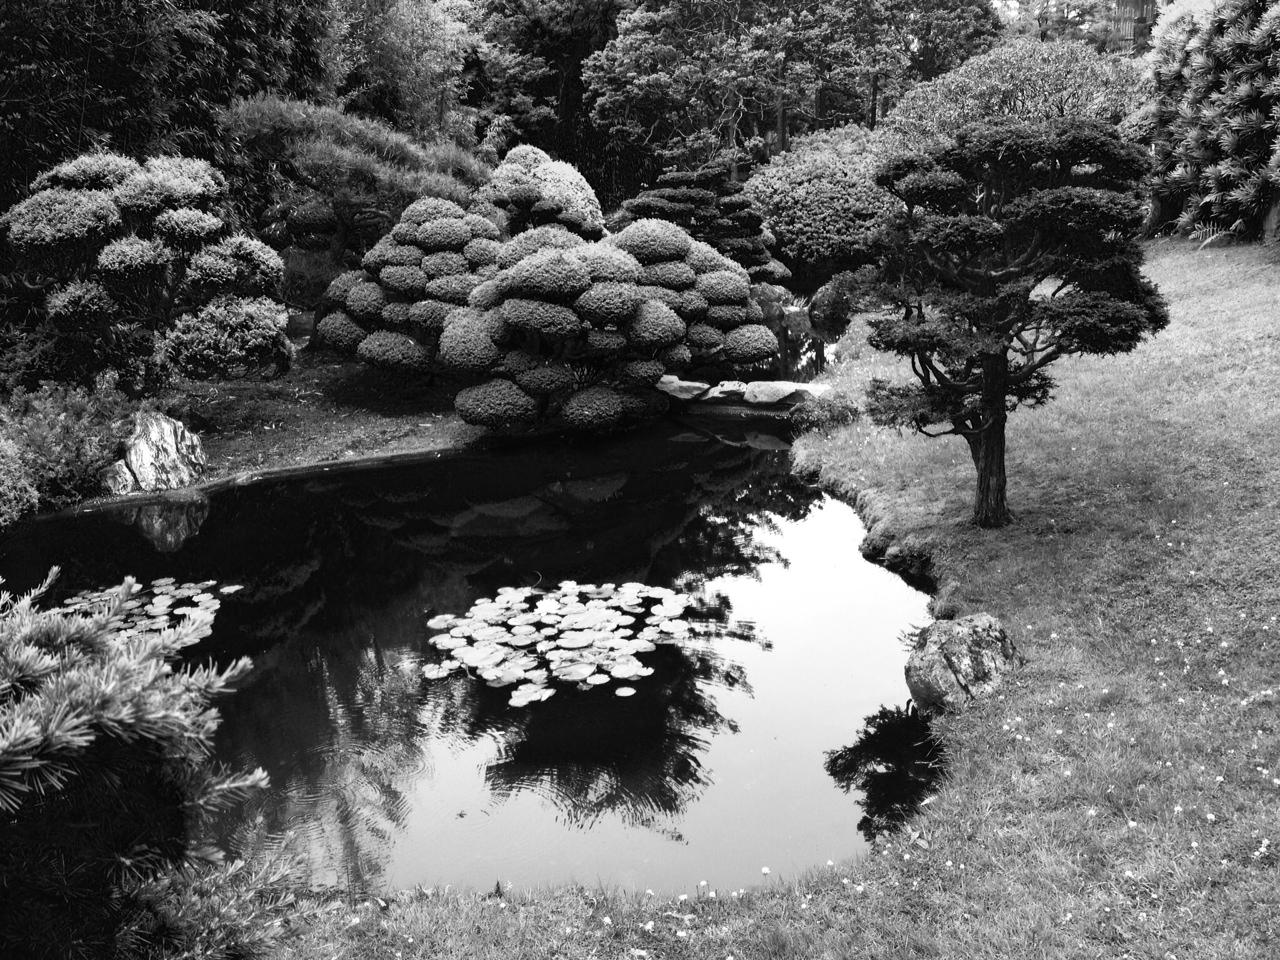 Man Caves Japanese Tea Garden : Phoneography japanese tea garden tells a story of harmony